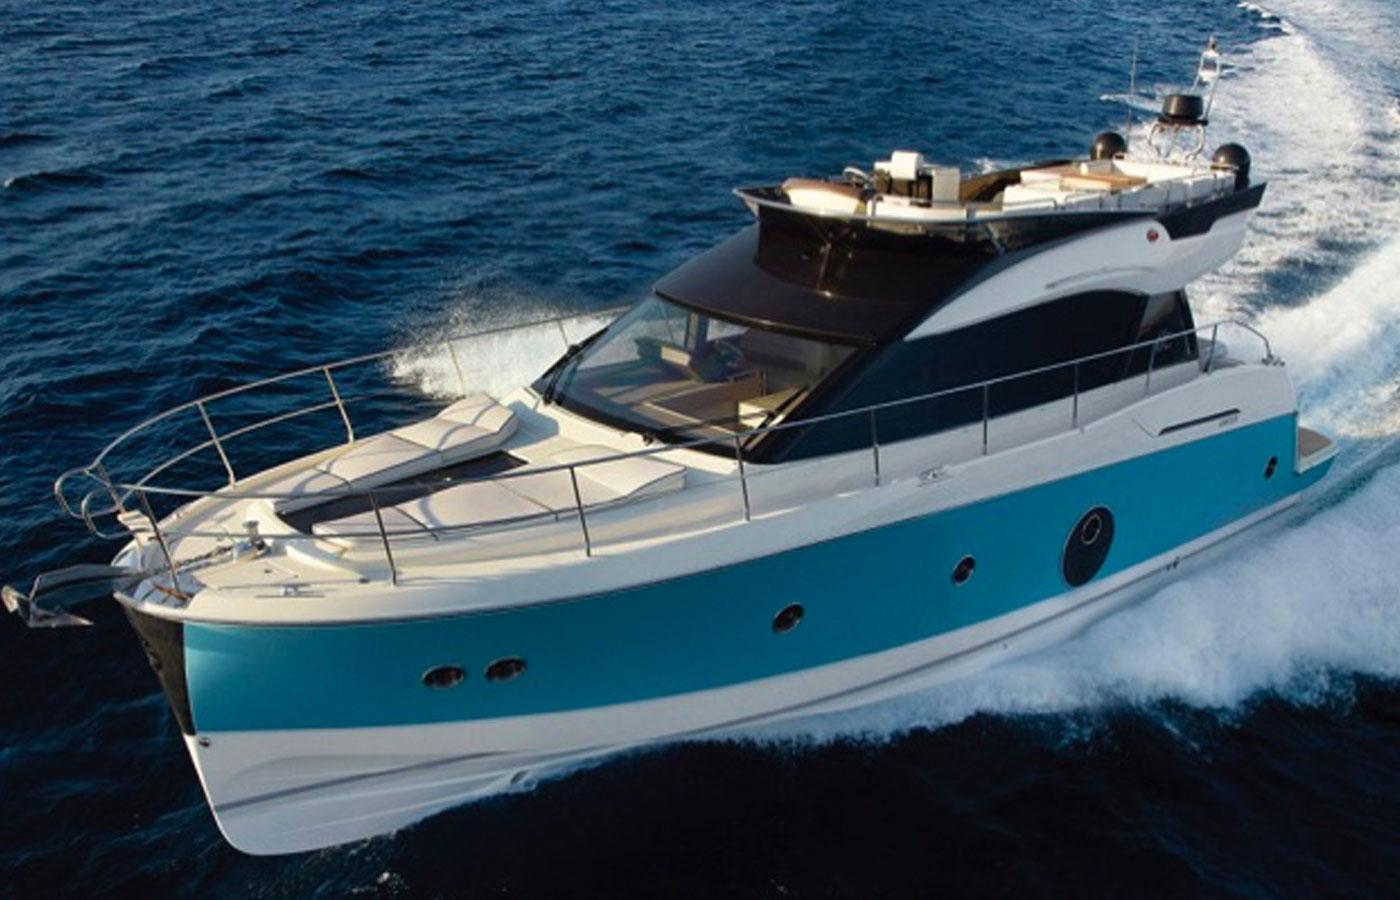 Beneteau Monte Carlo 5: Italian Styling Never Looked So Good